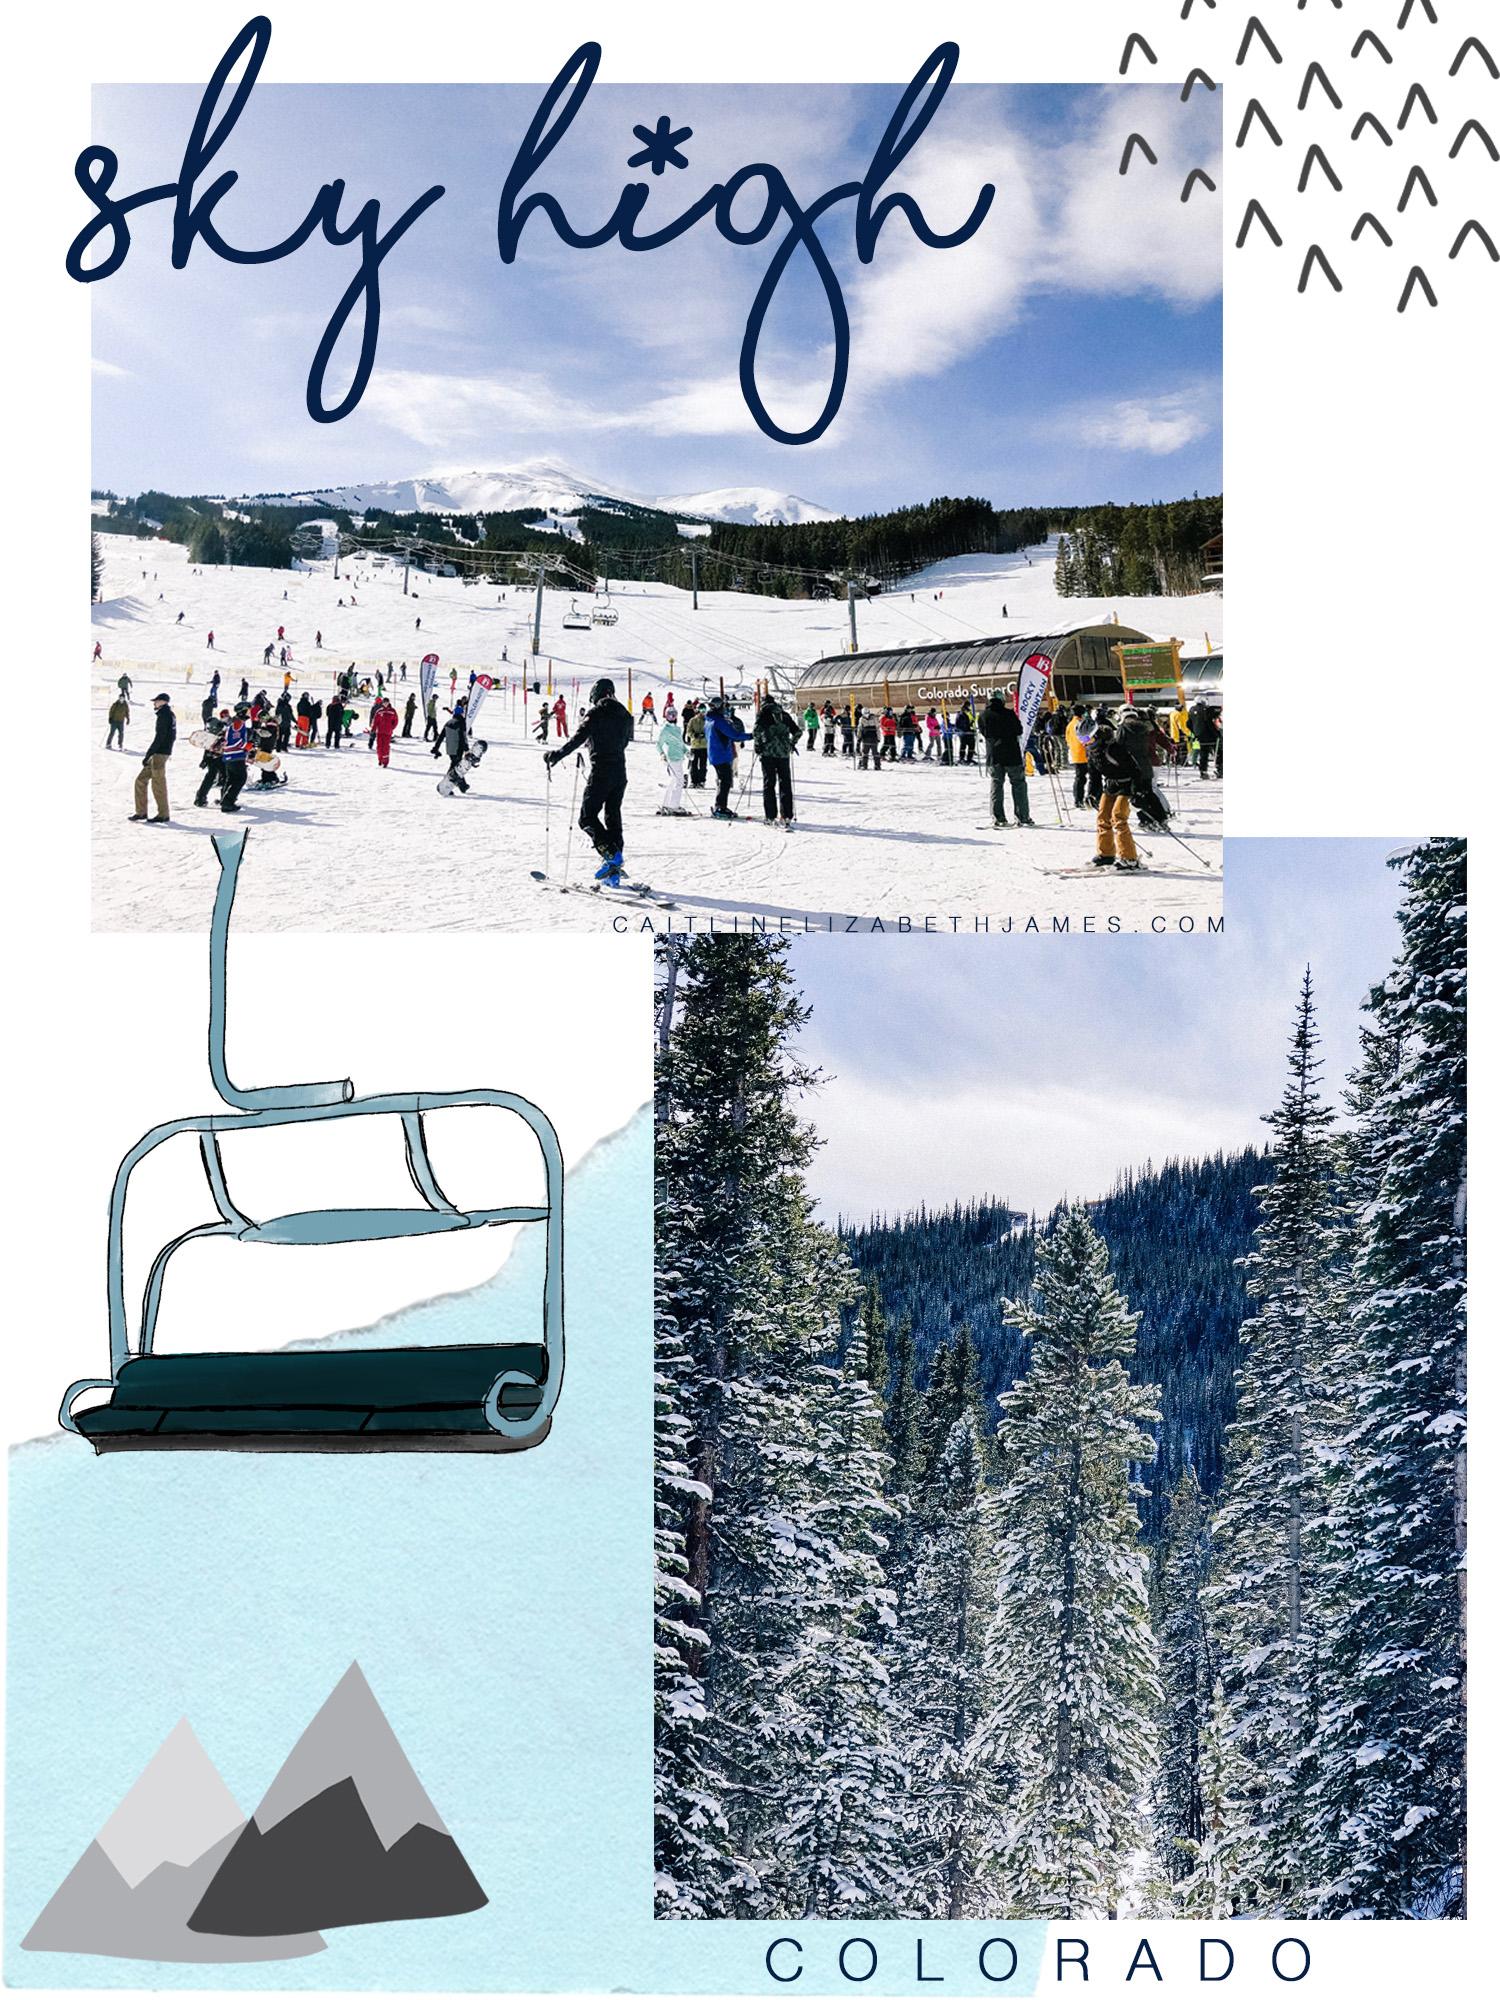 COLORADO-breckenridge-caitlin-elizabeth-james-wrap-up-skiing-travel-february.jpg